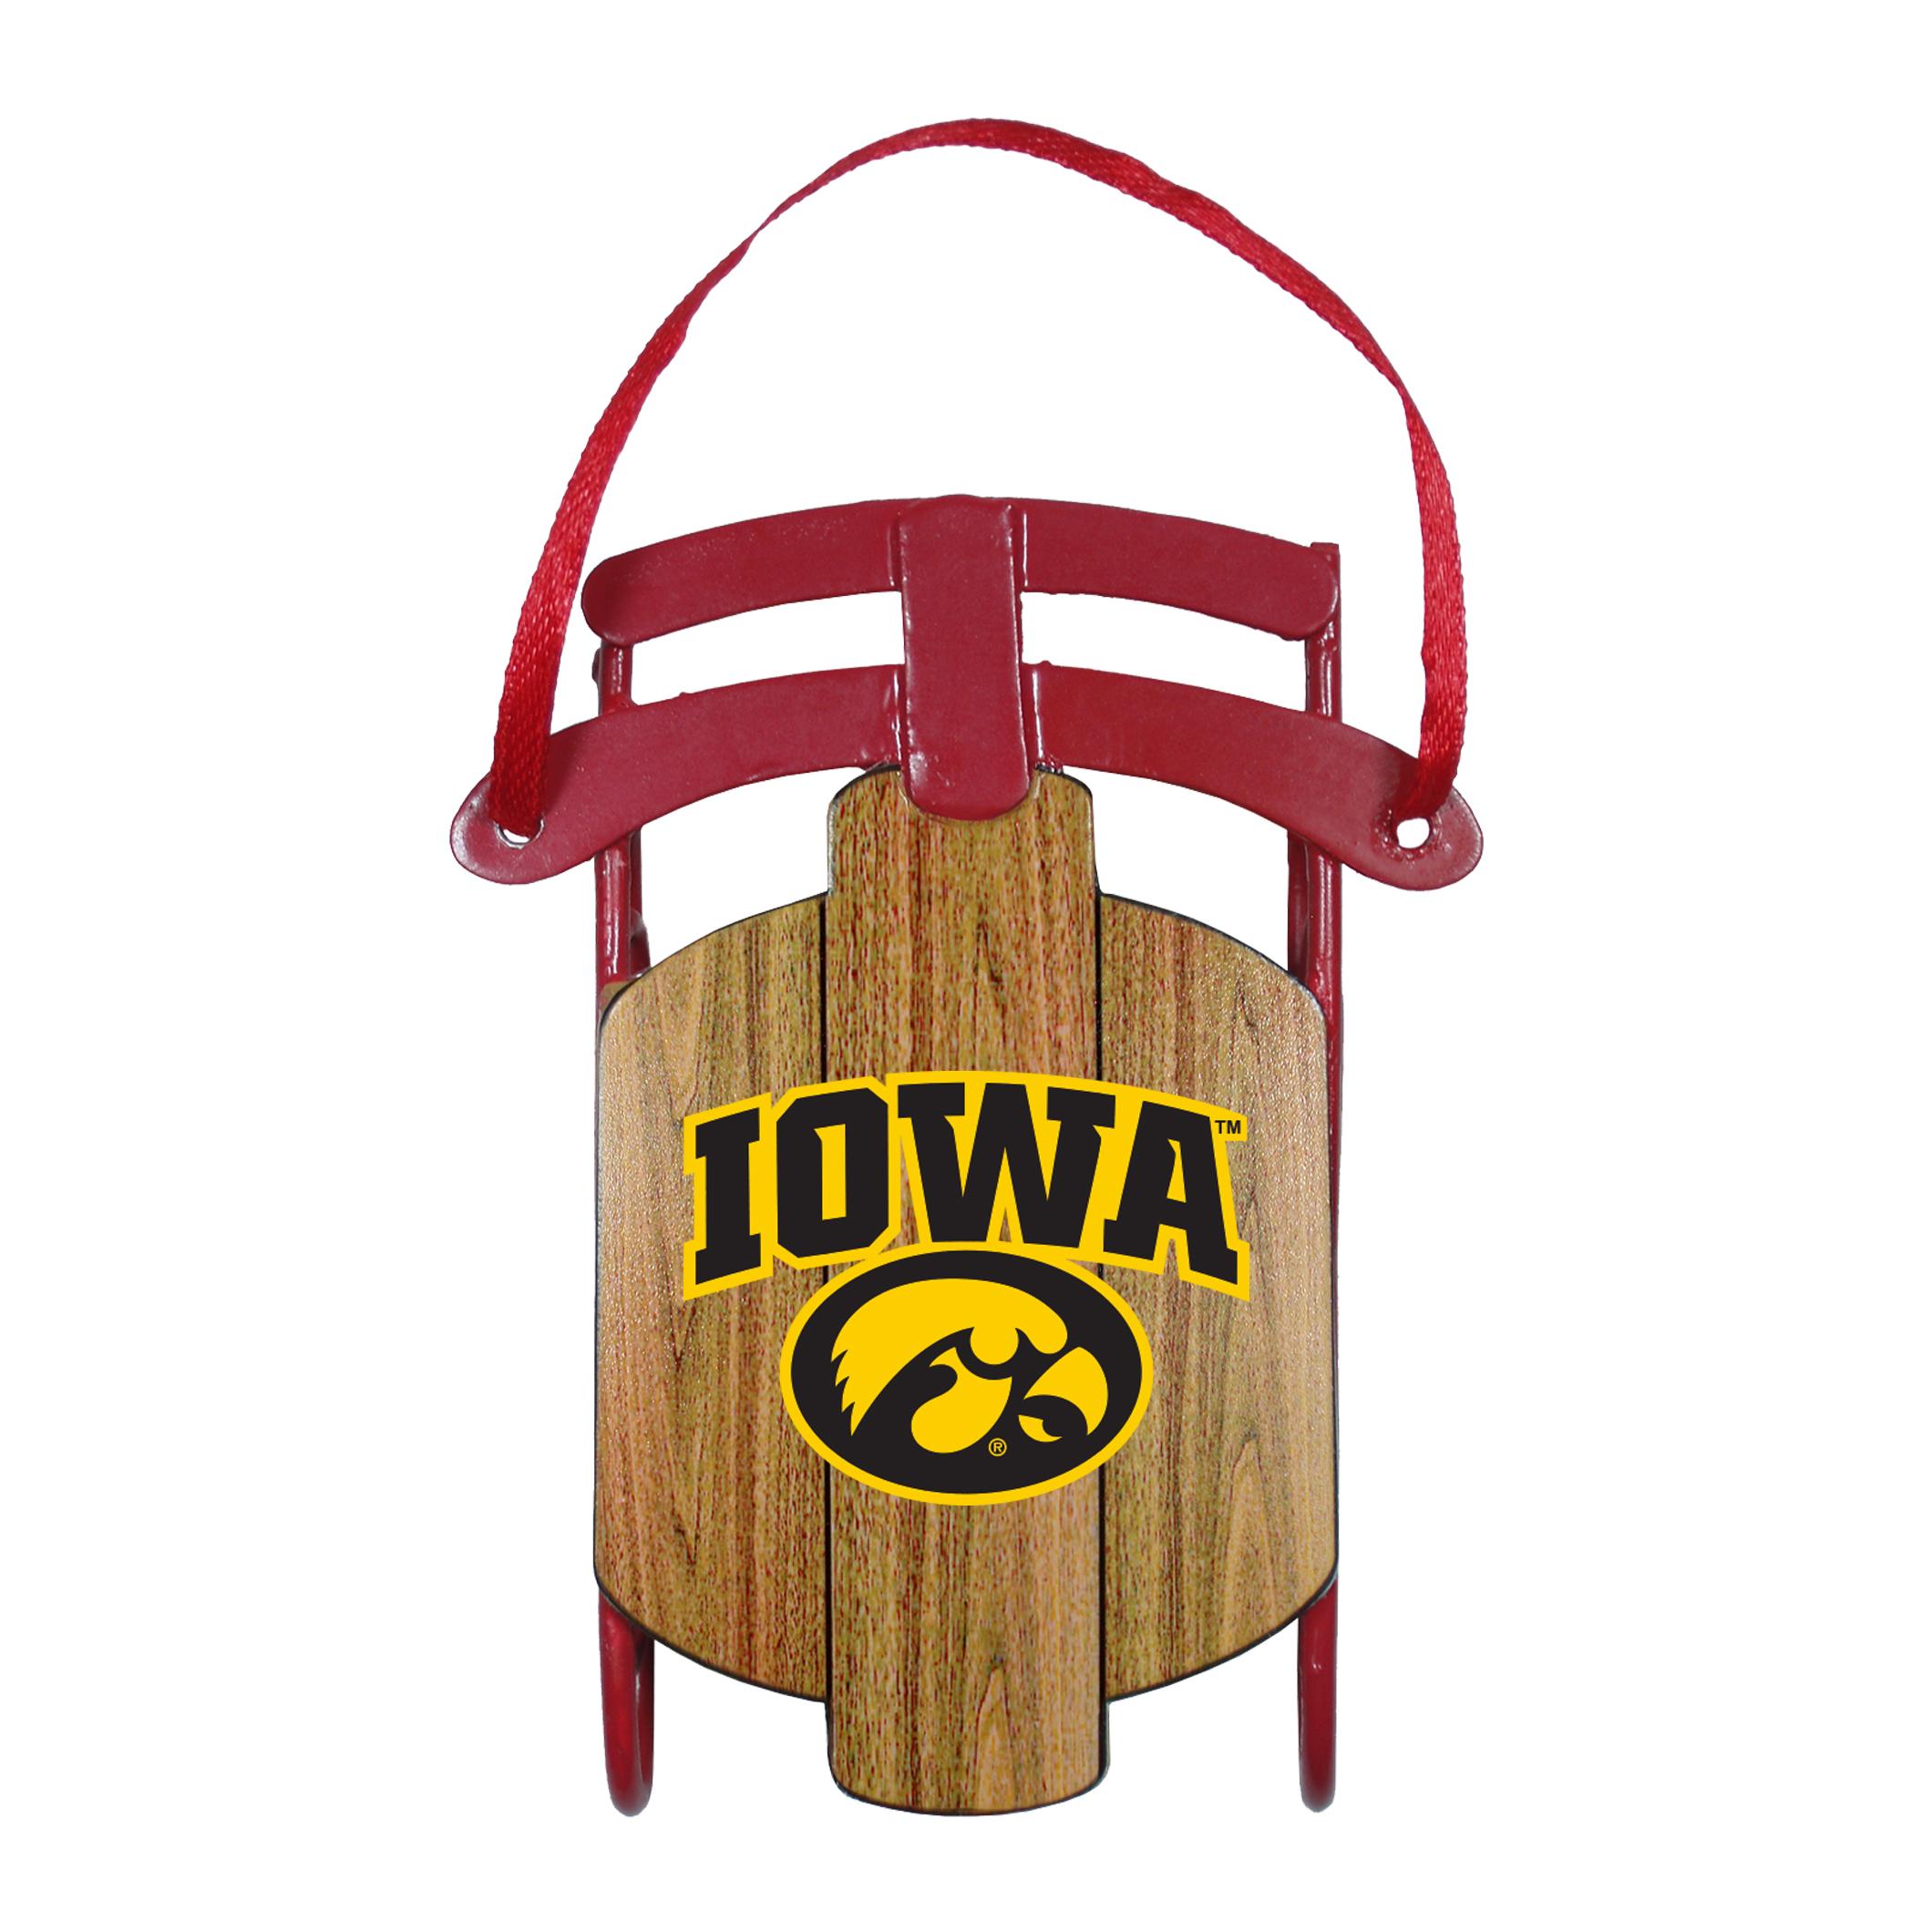 Iowa Hawkeyes Ornament - Metal Sled